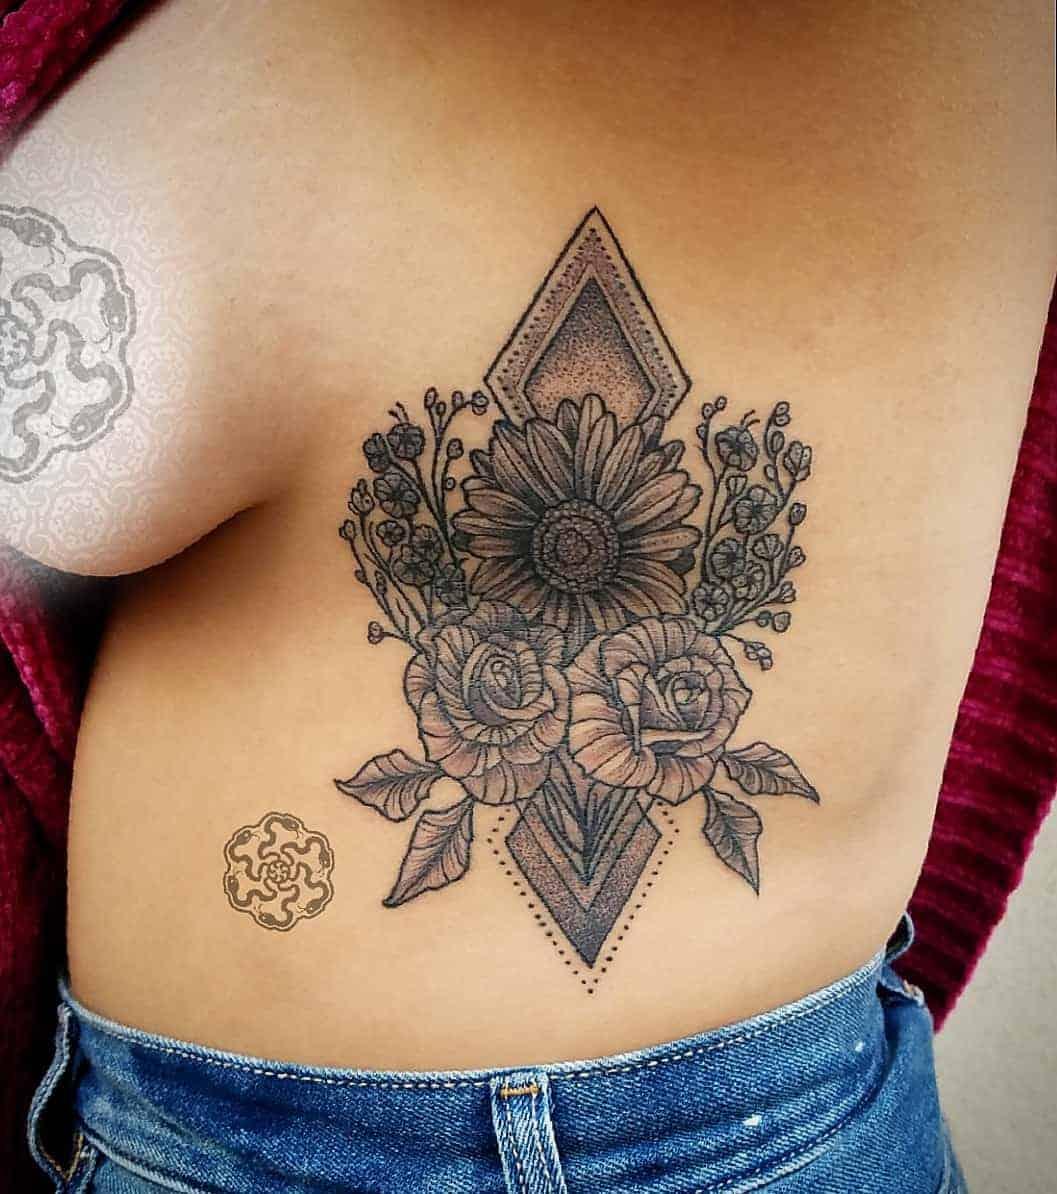 blackwork tattoo of floral arrangement on ribs